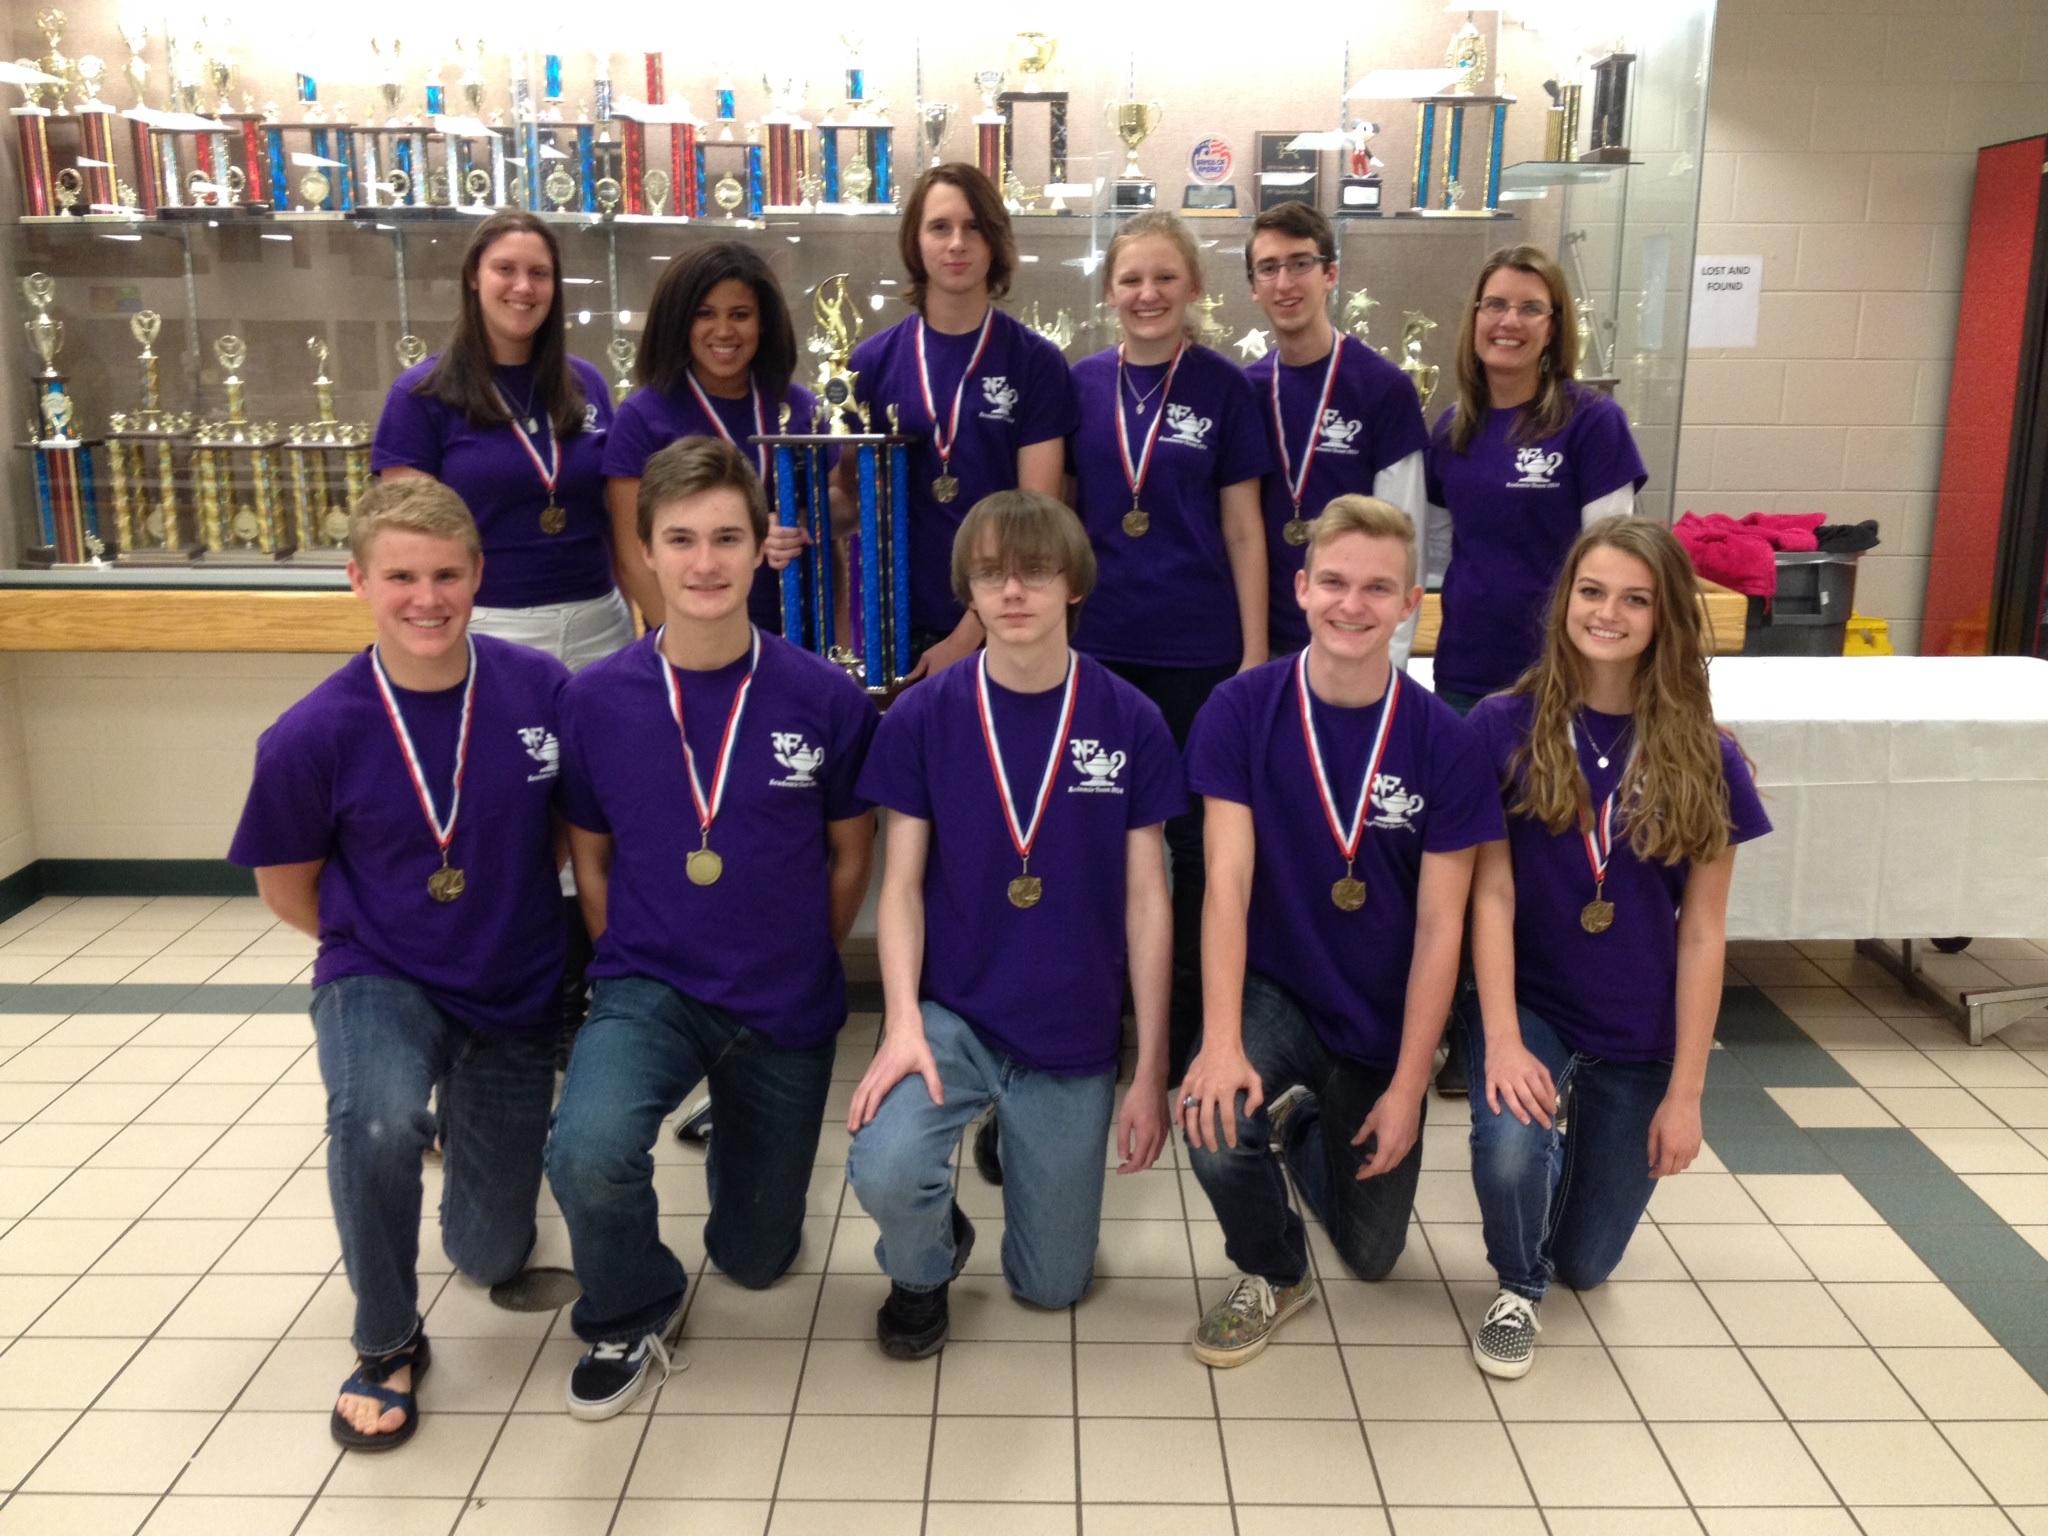 NFHS Varsity Academic Team Wins Regional